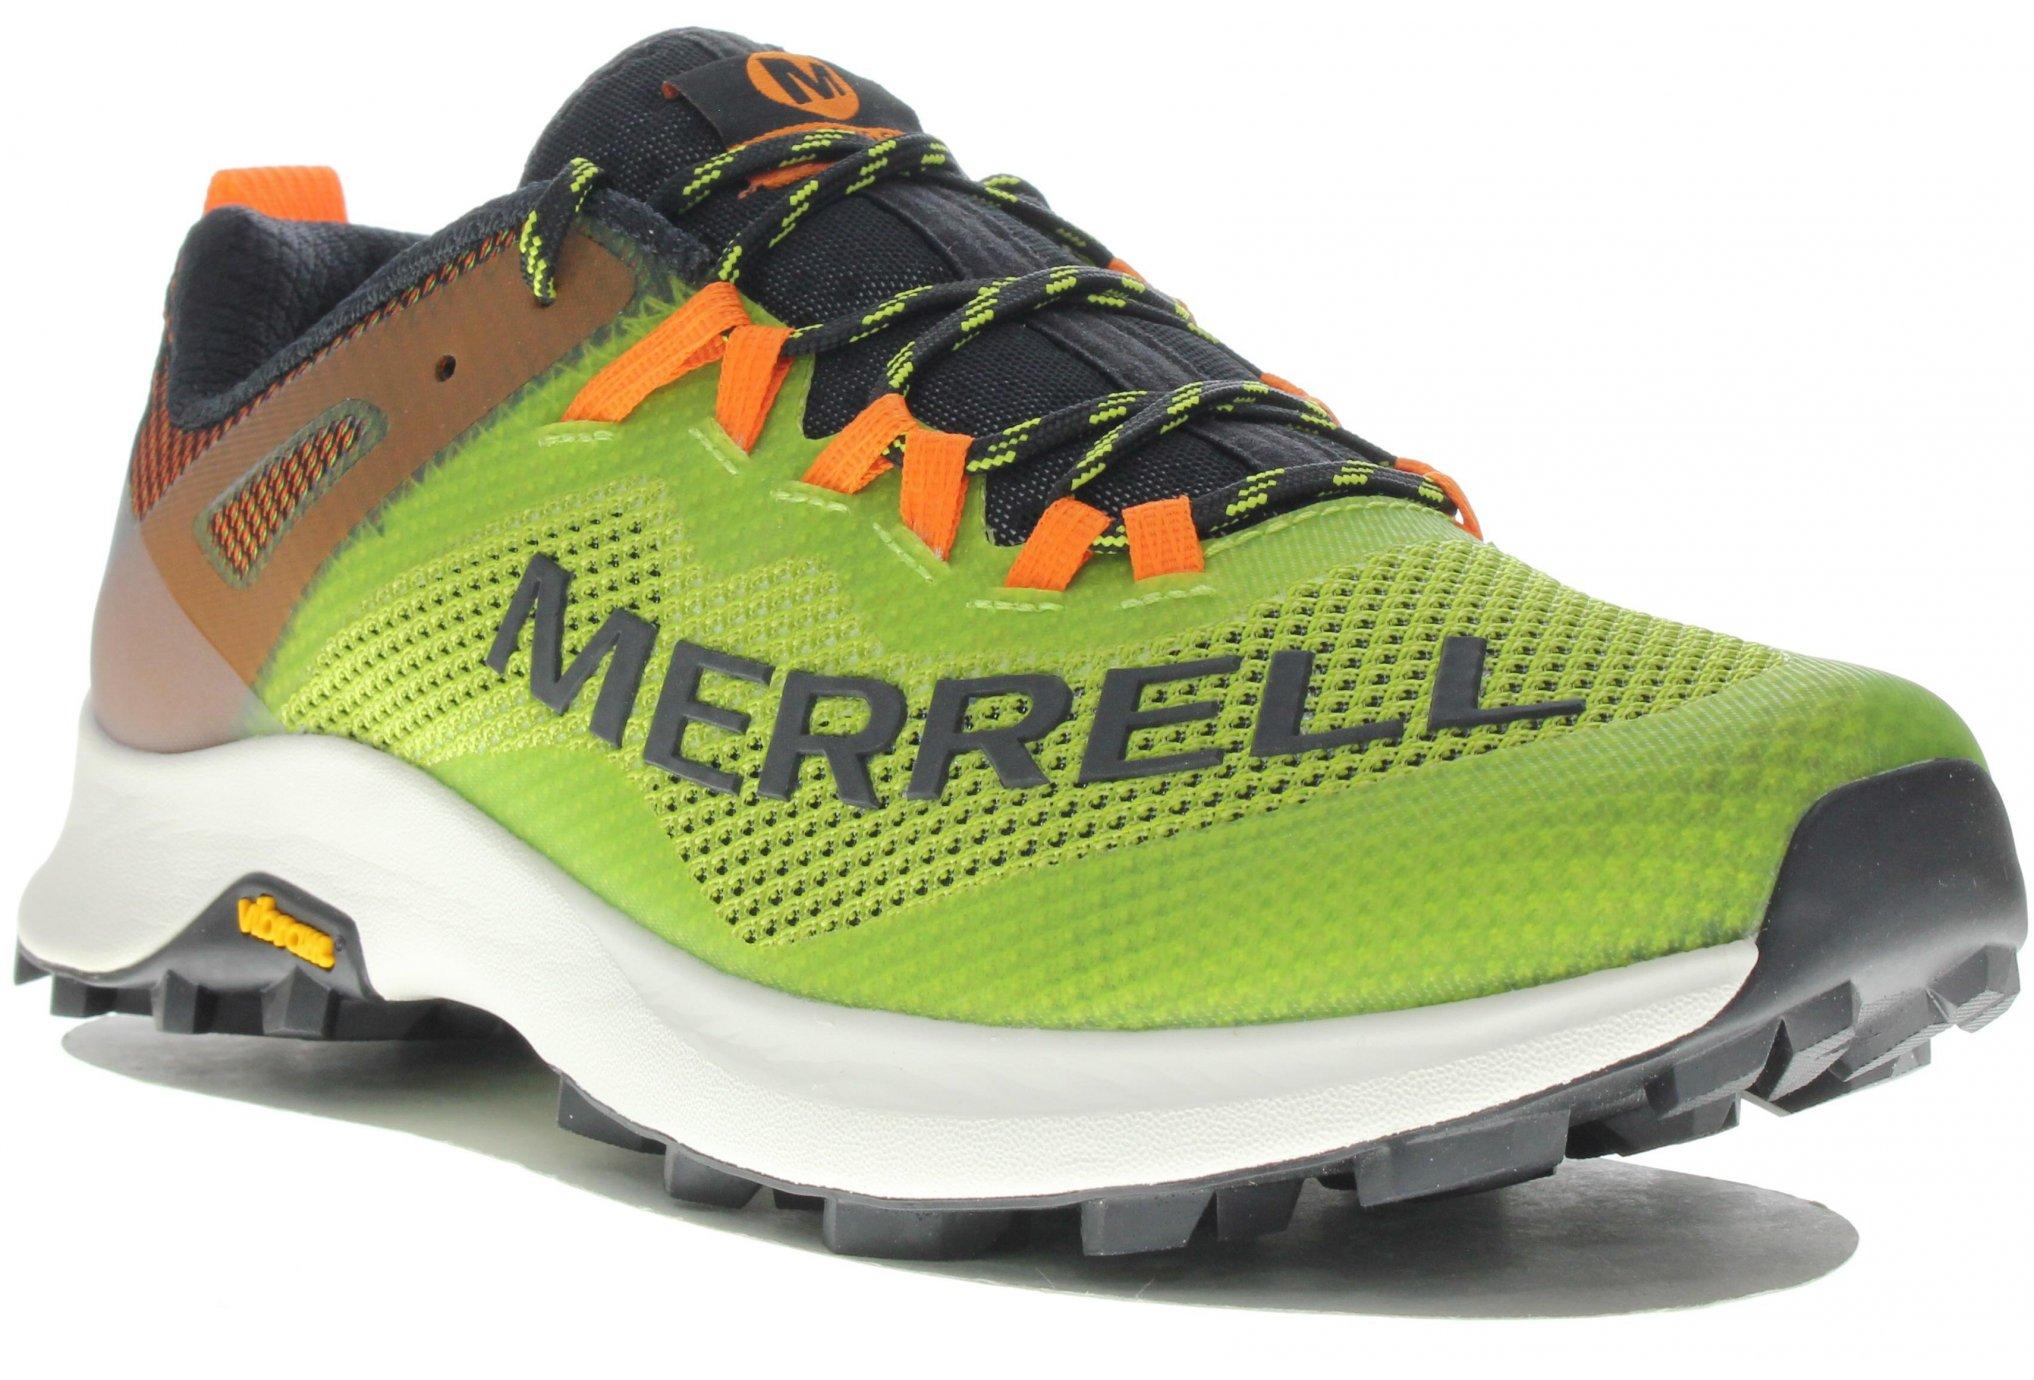 Merrell MTL Long Sky M Diététique Chaussures homme